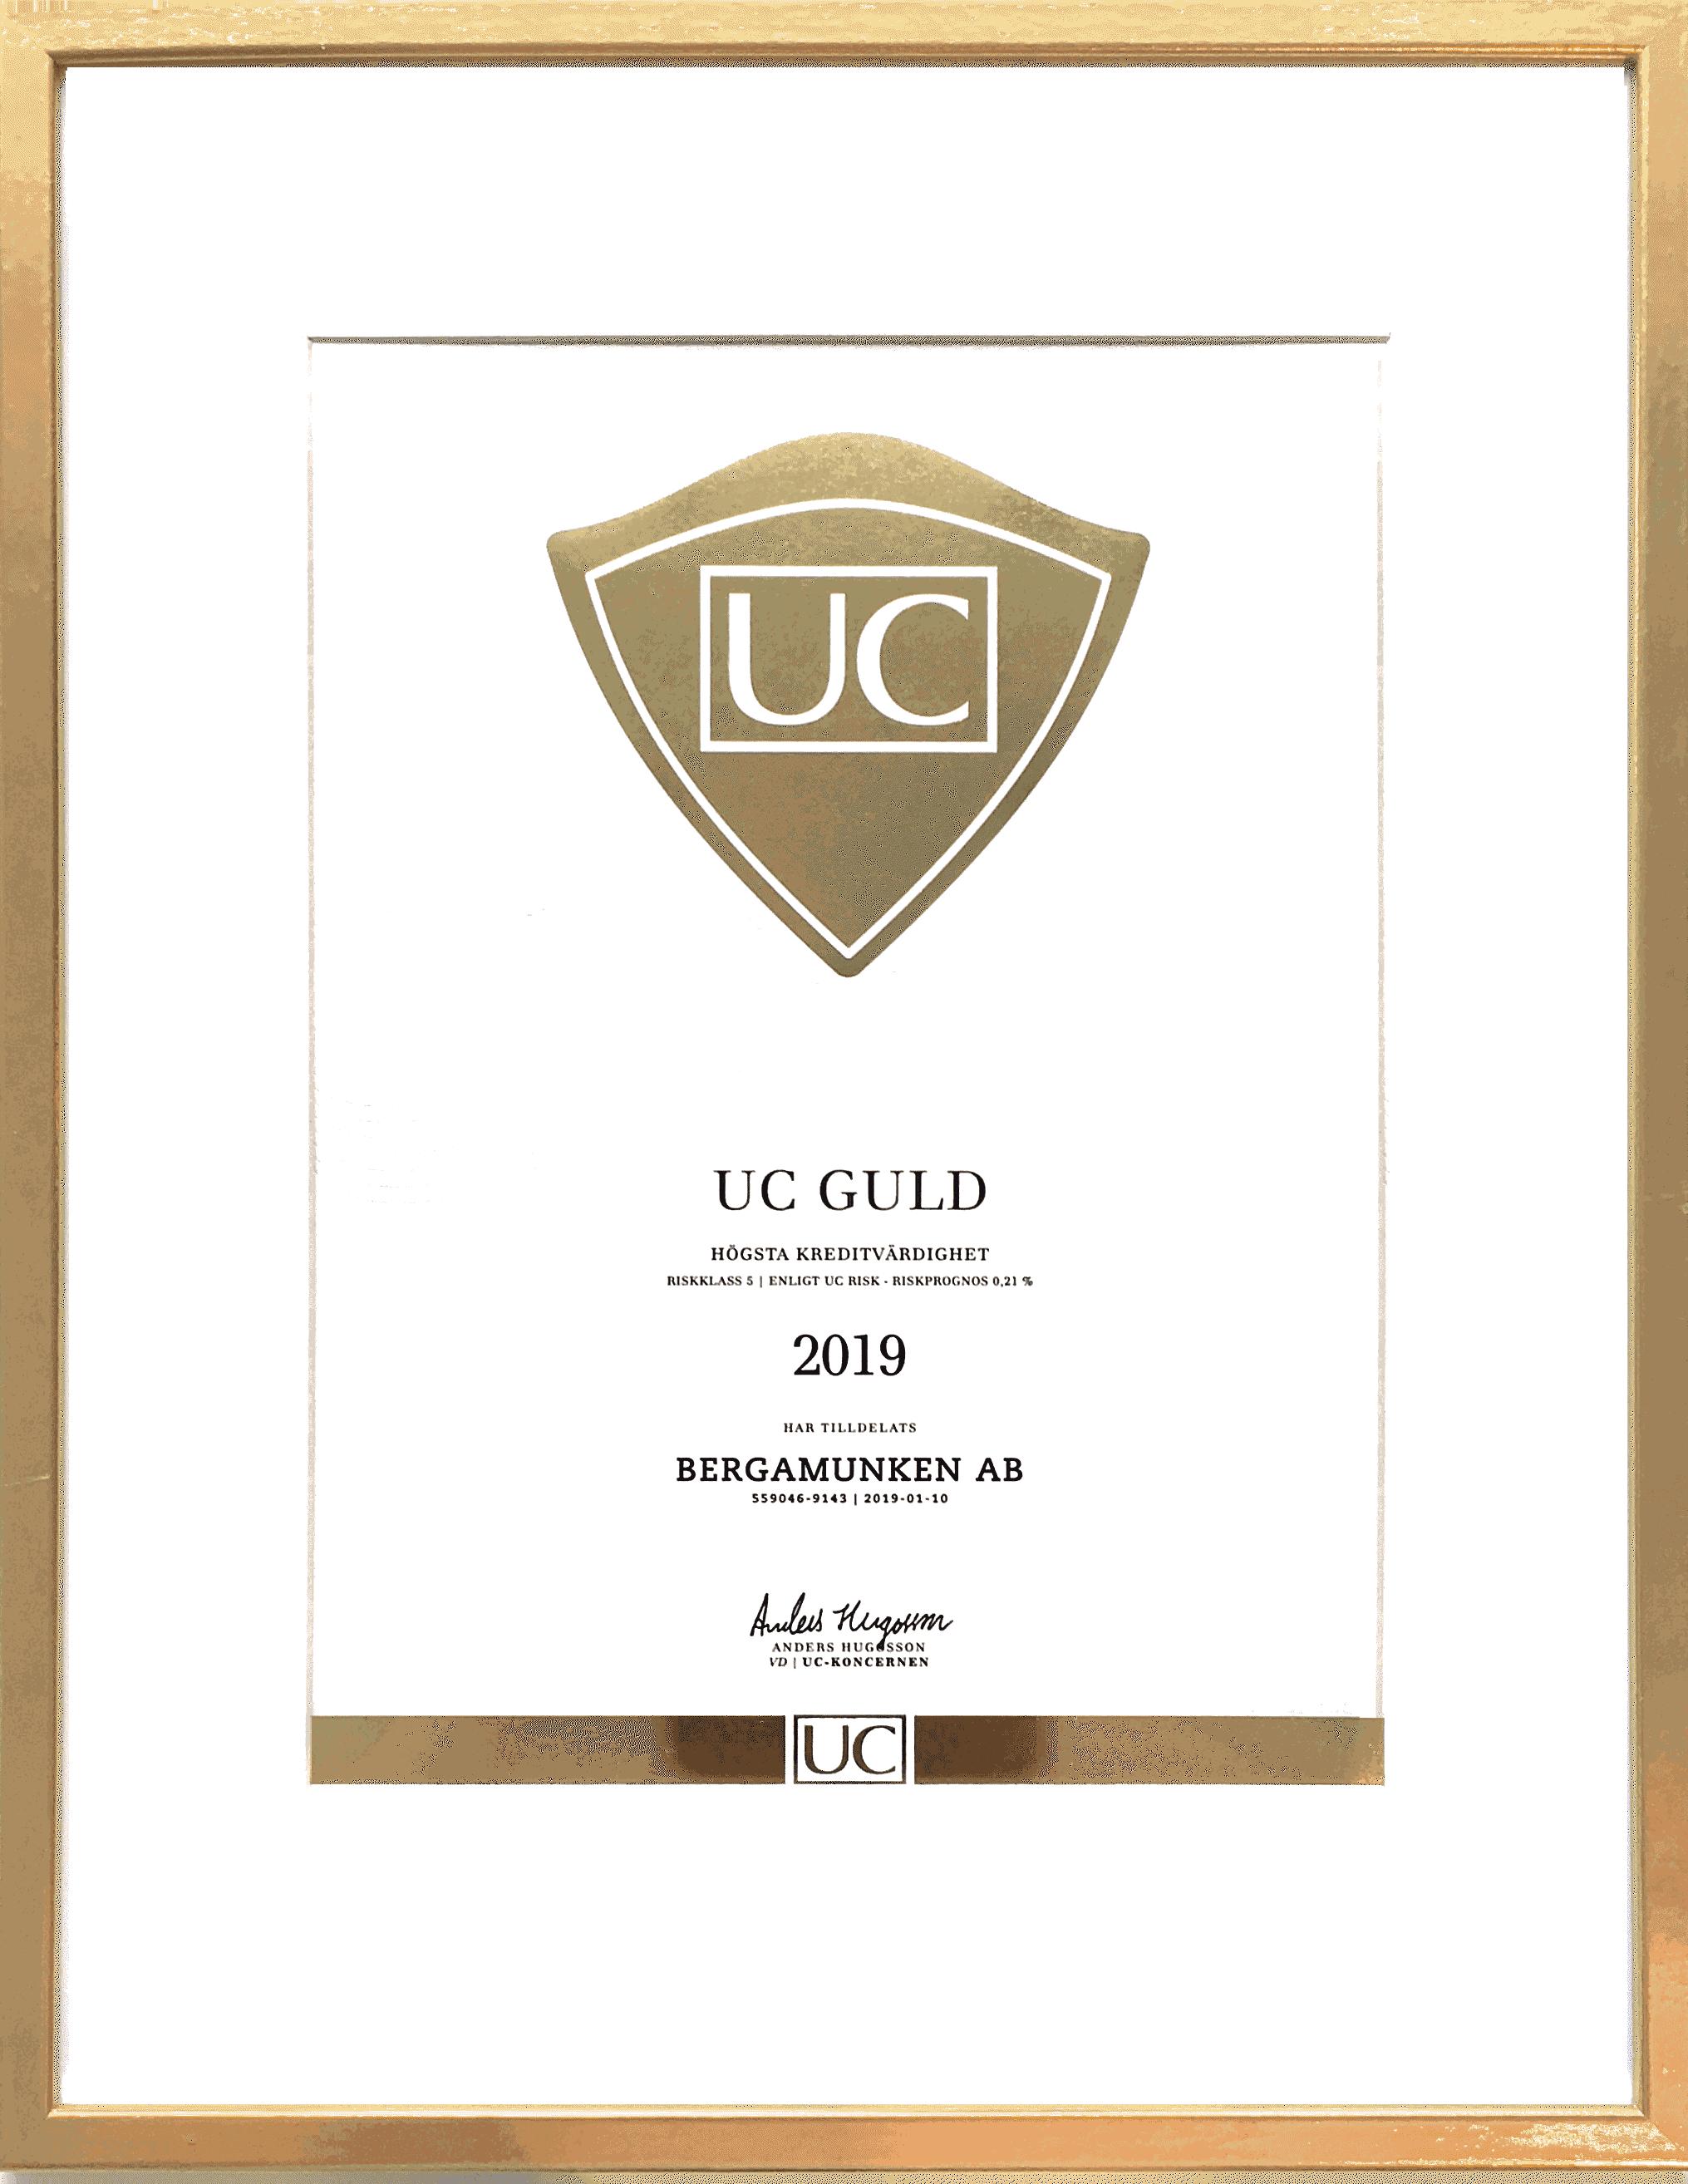 UC Guld kreditbetyg 2019 - Bergamunken AB